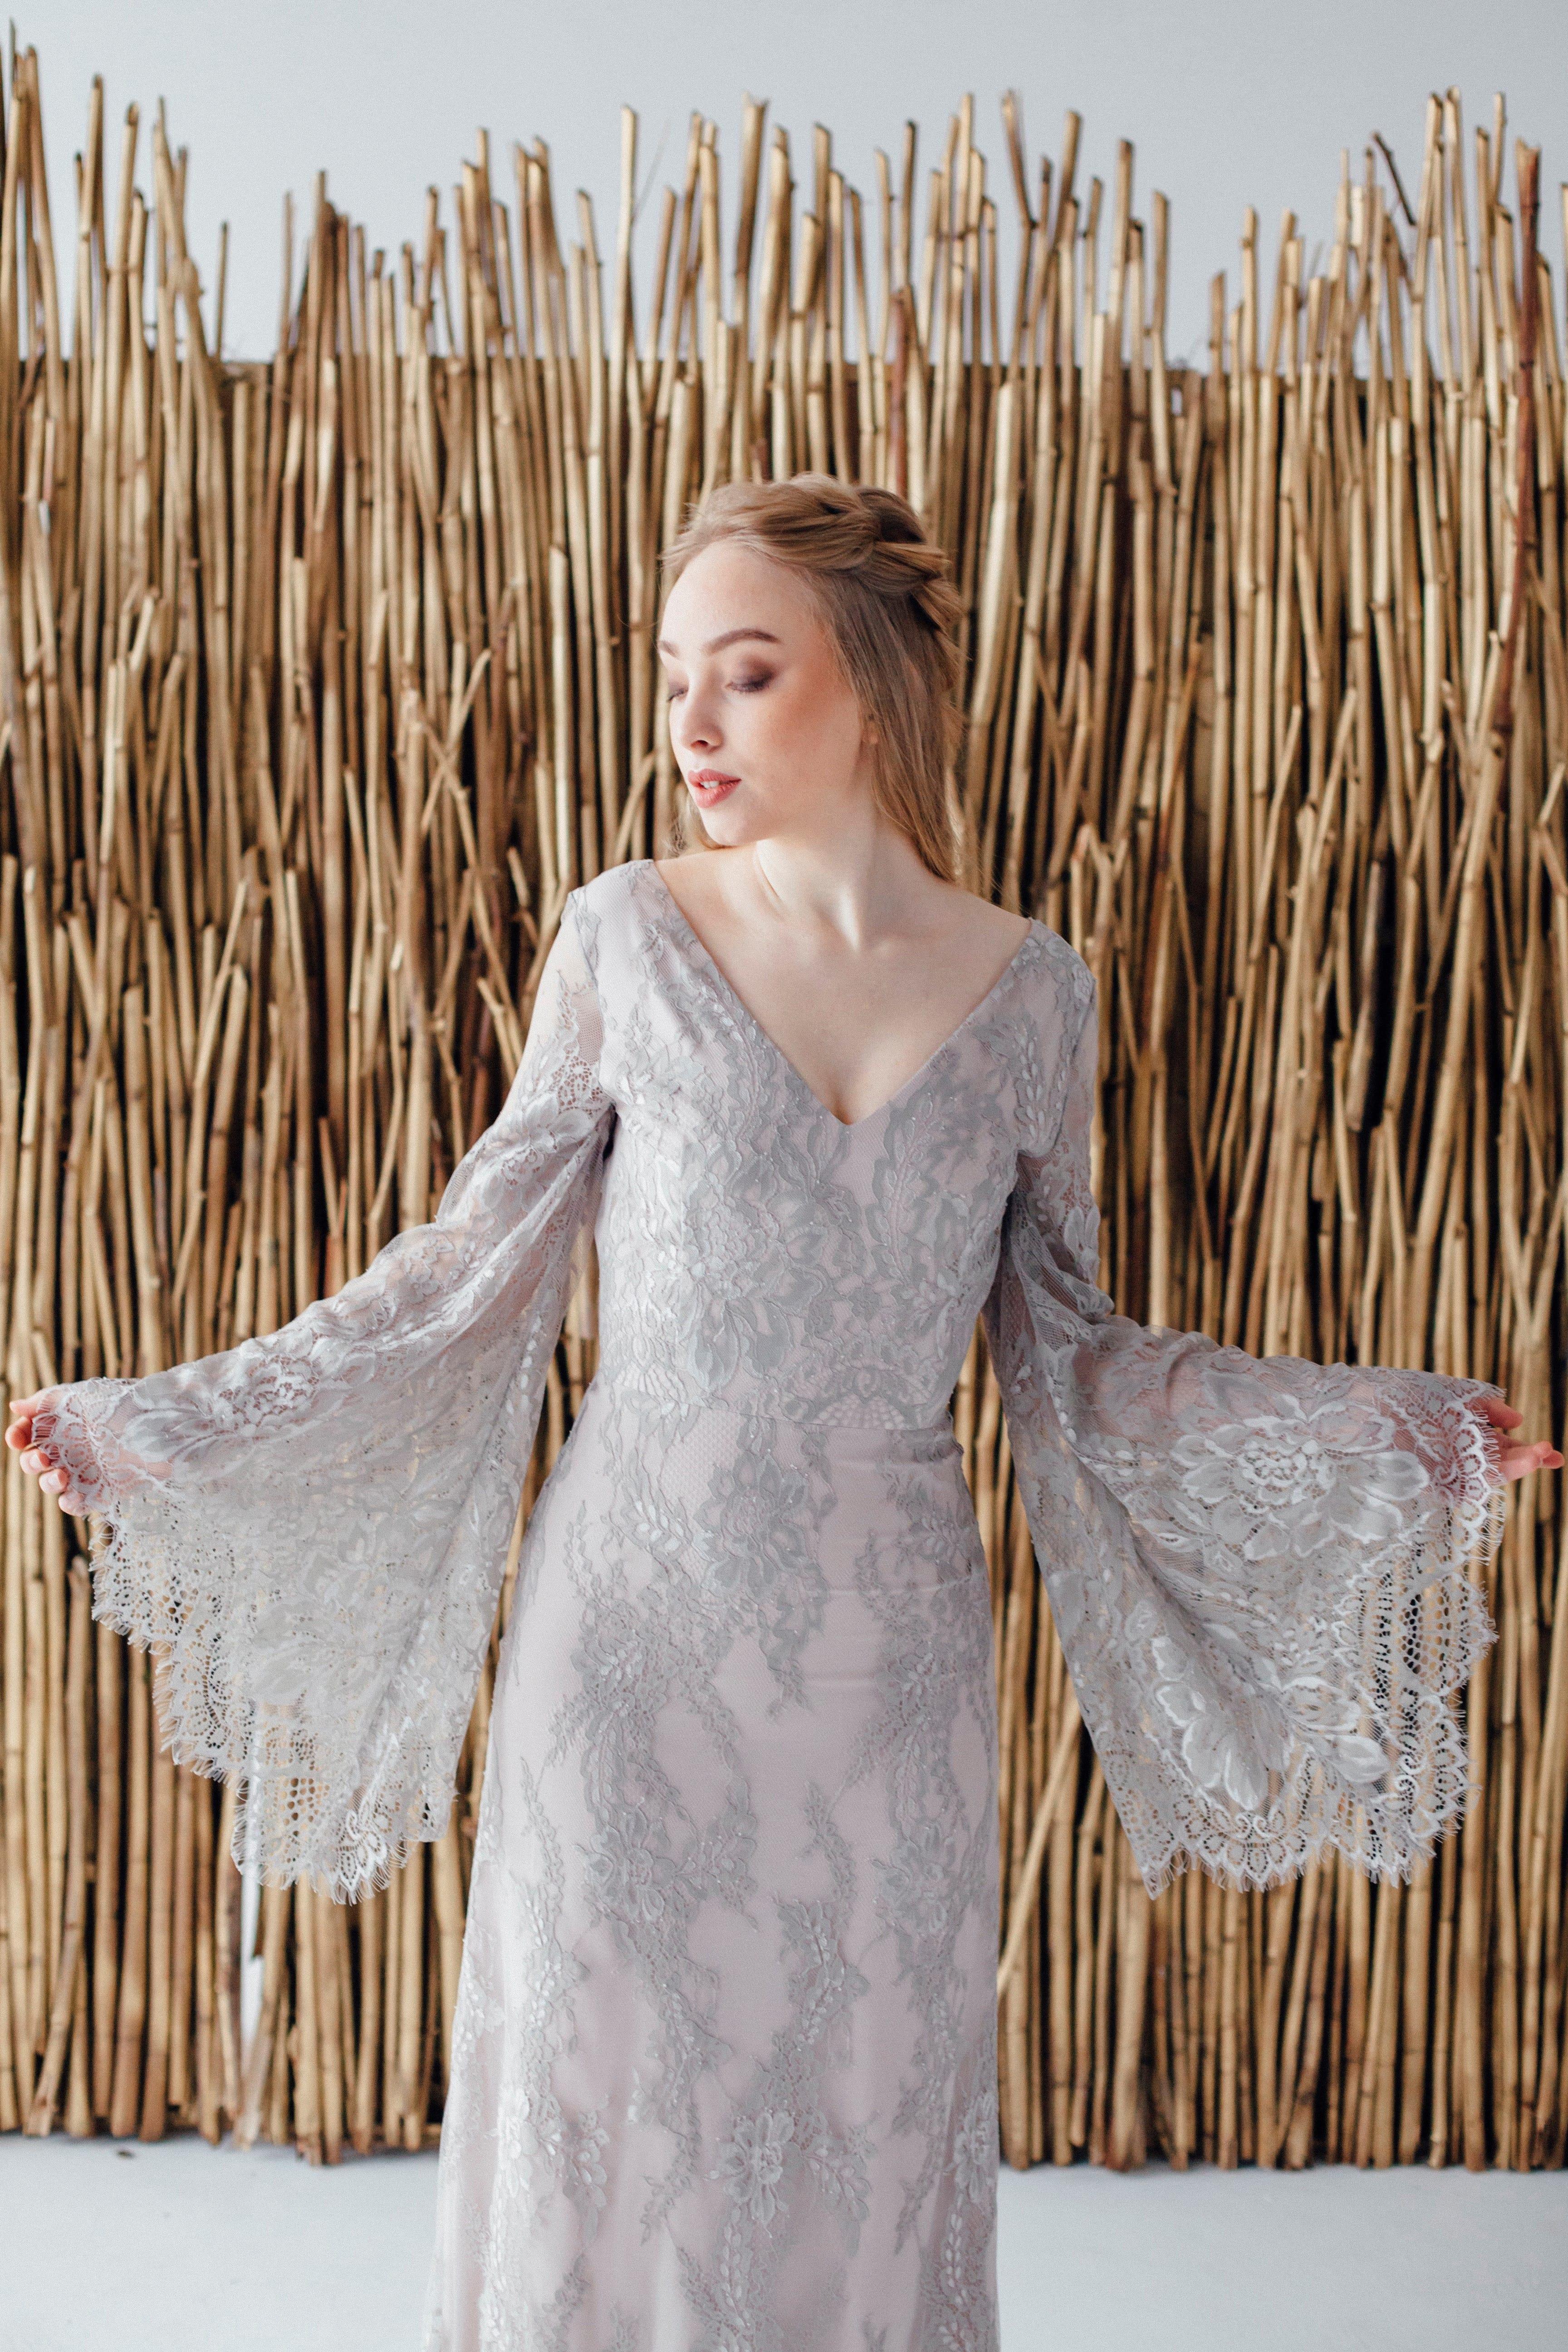 Свадебное платье NANA, коллекция MAGIC OF TENDERNESS, бренд LORA SONG, фото 4